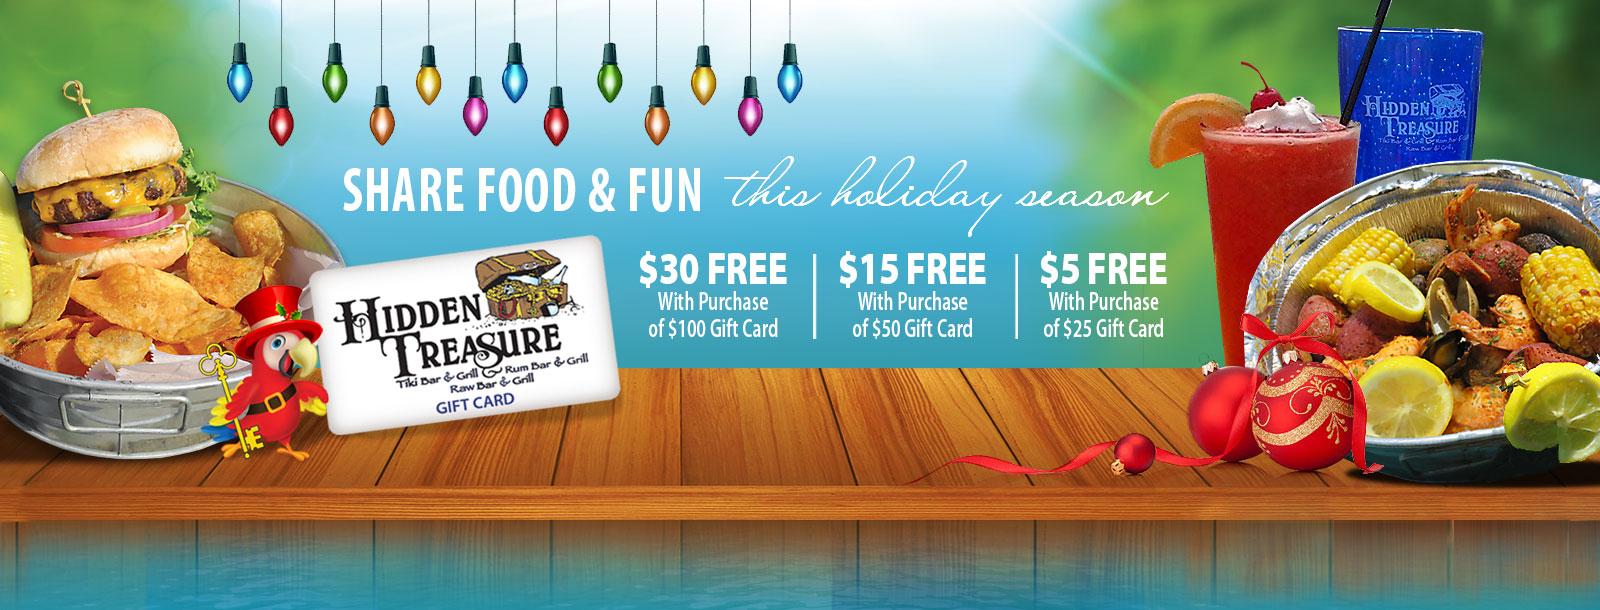 Holiday Gift Cards Christmas 2018 Daytona Beach